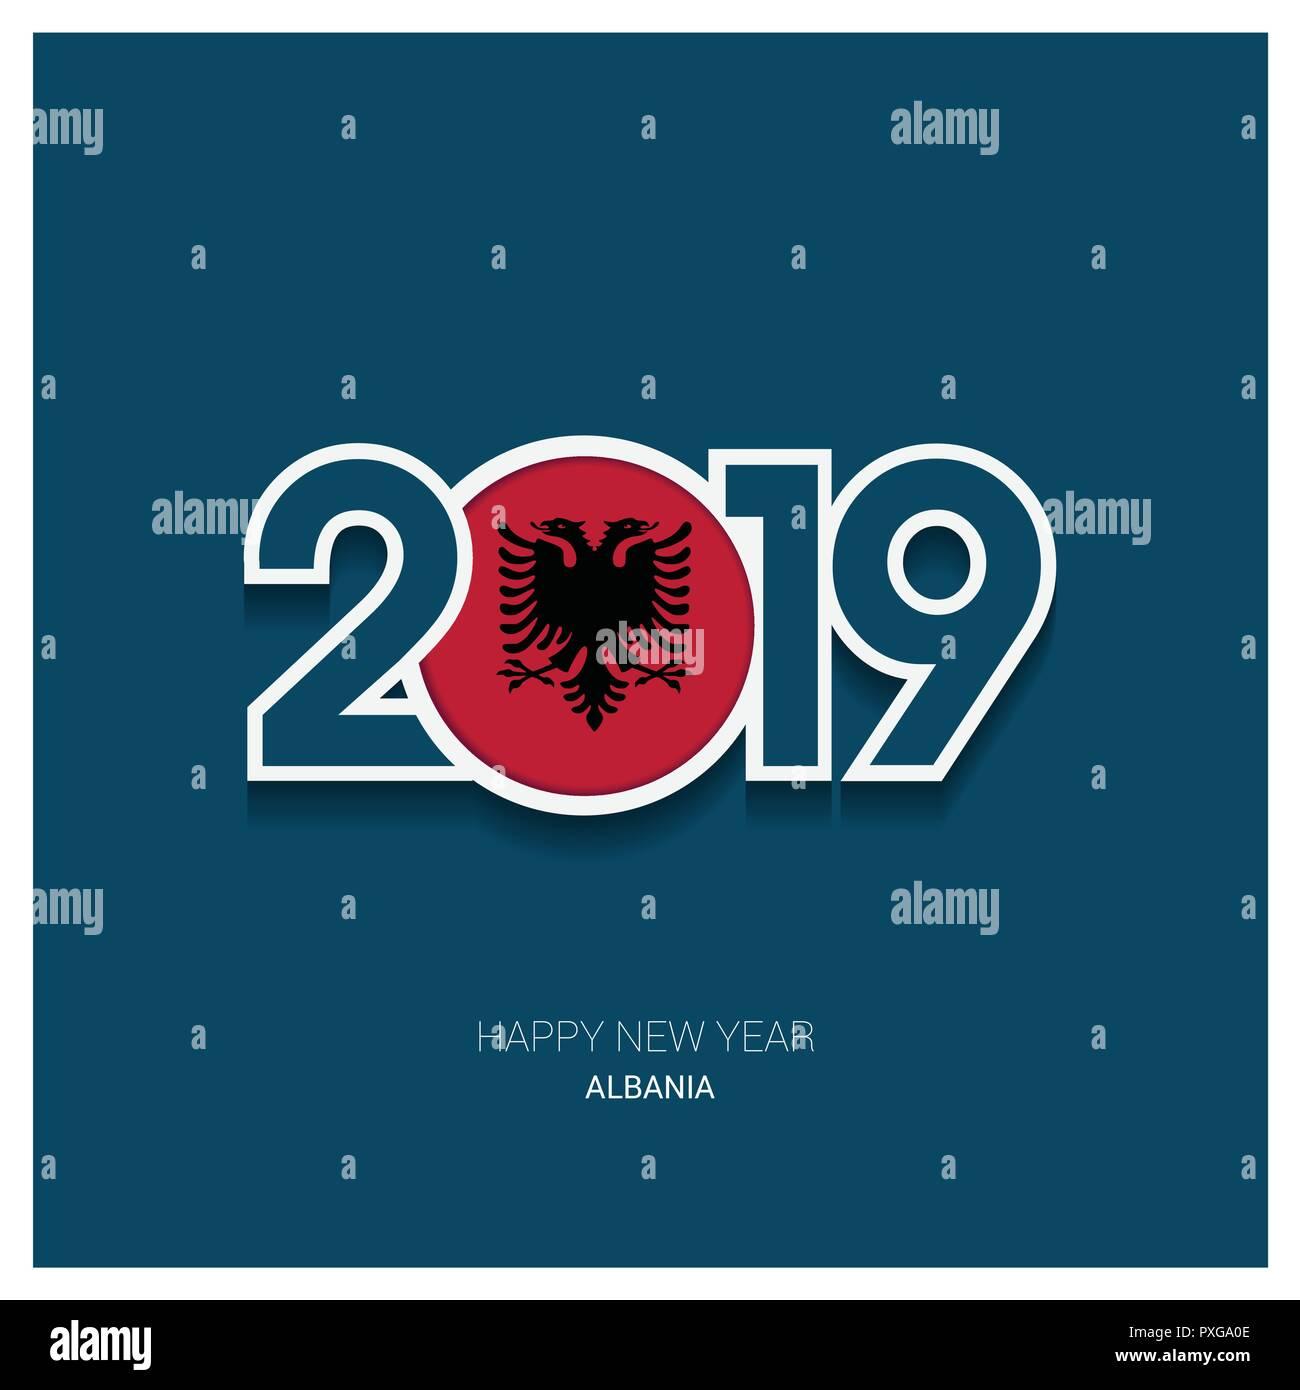 2019 Albania Typography, Happy New Year Background - Stock Image